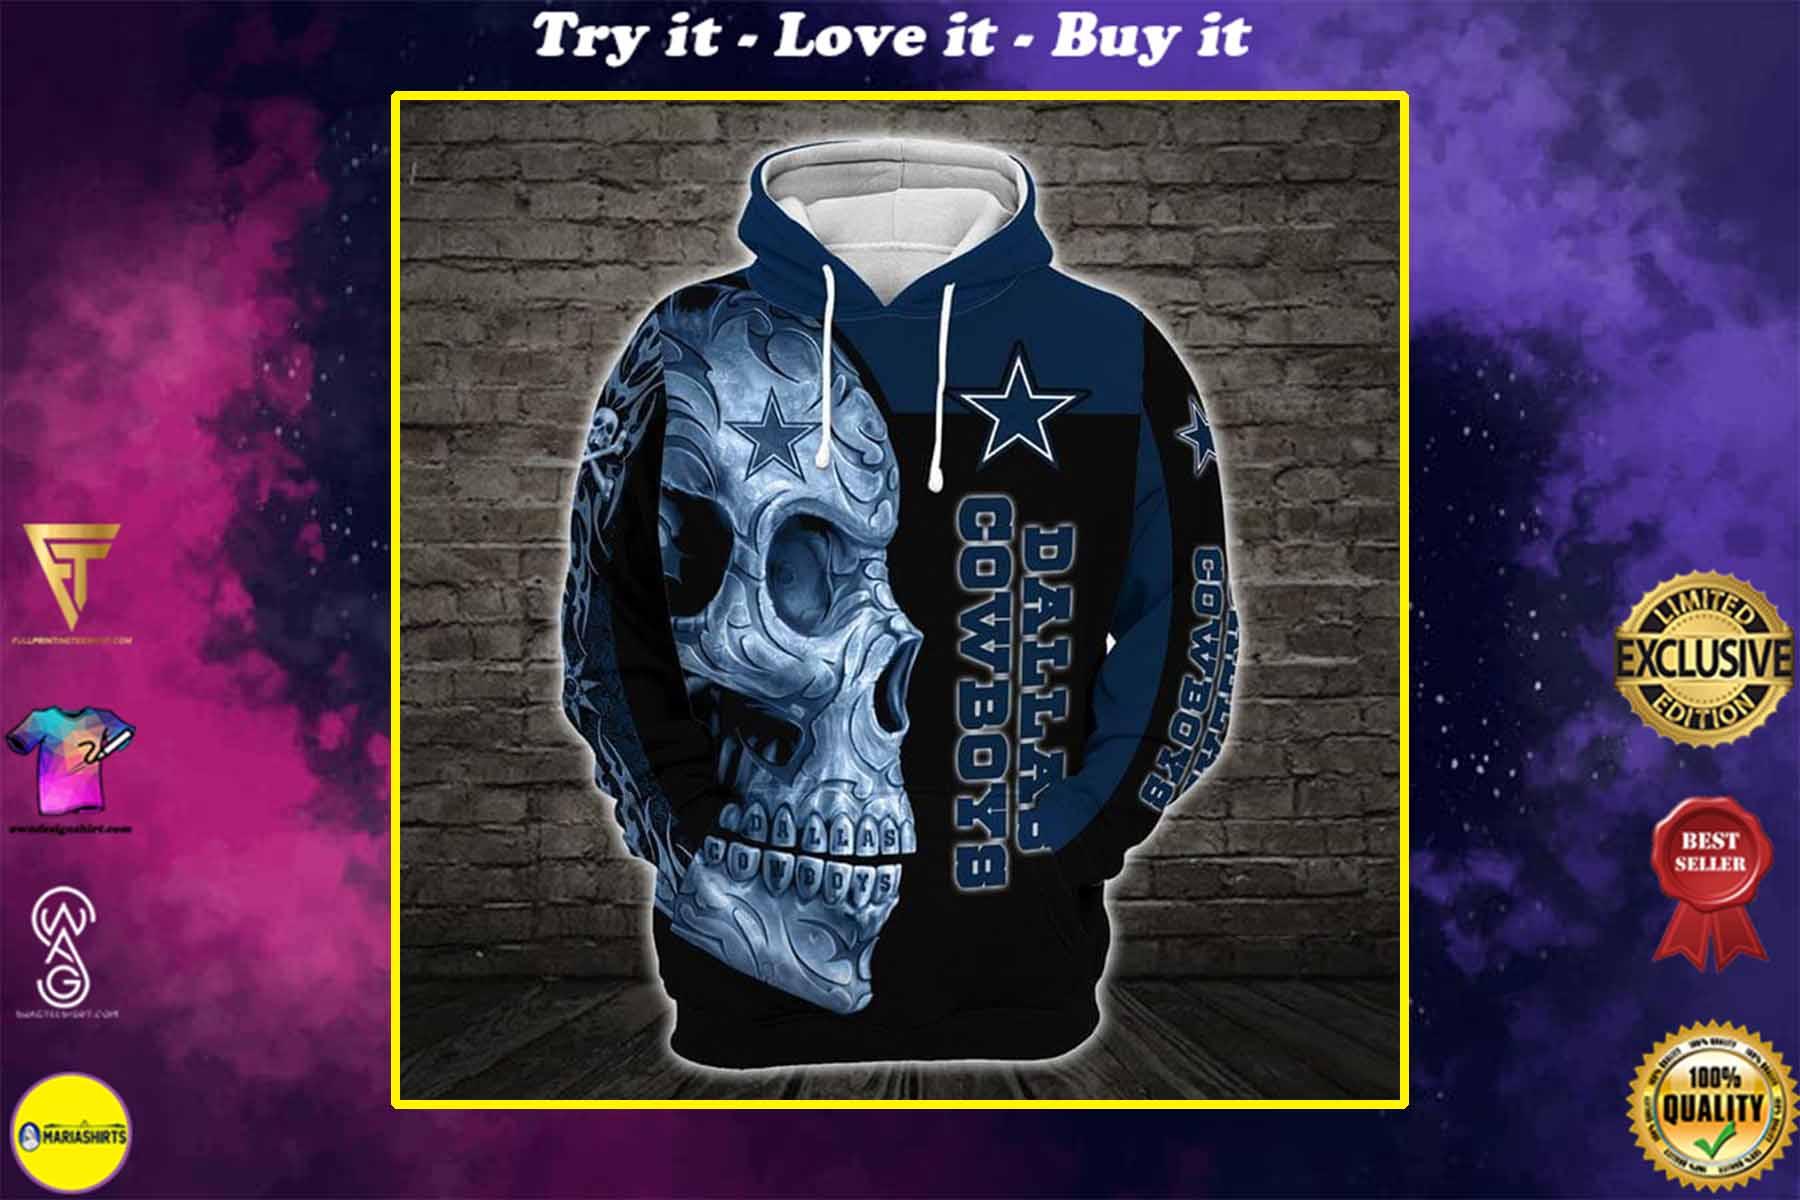 [special edition] sugar skull dallas cowboys football team full over printed shirt - maria